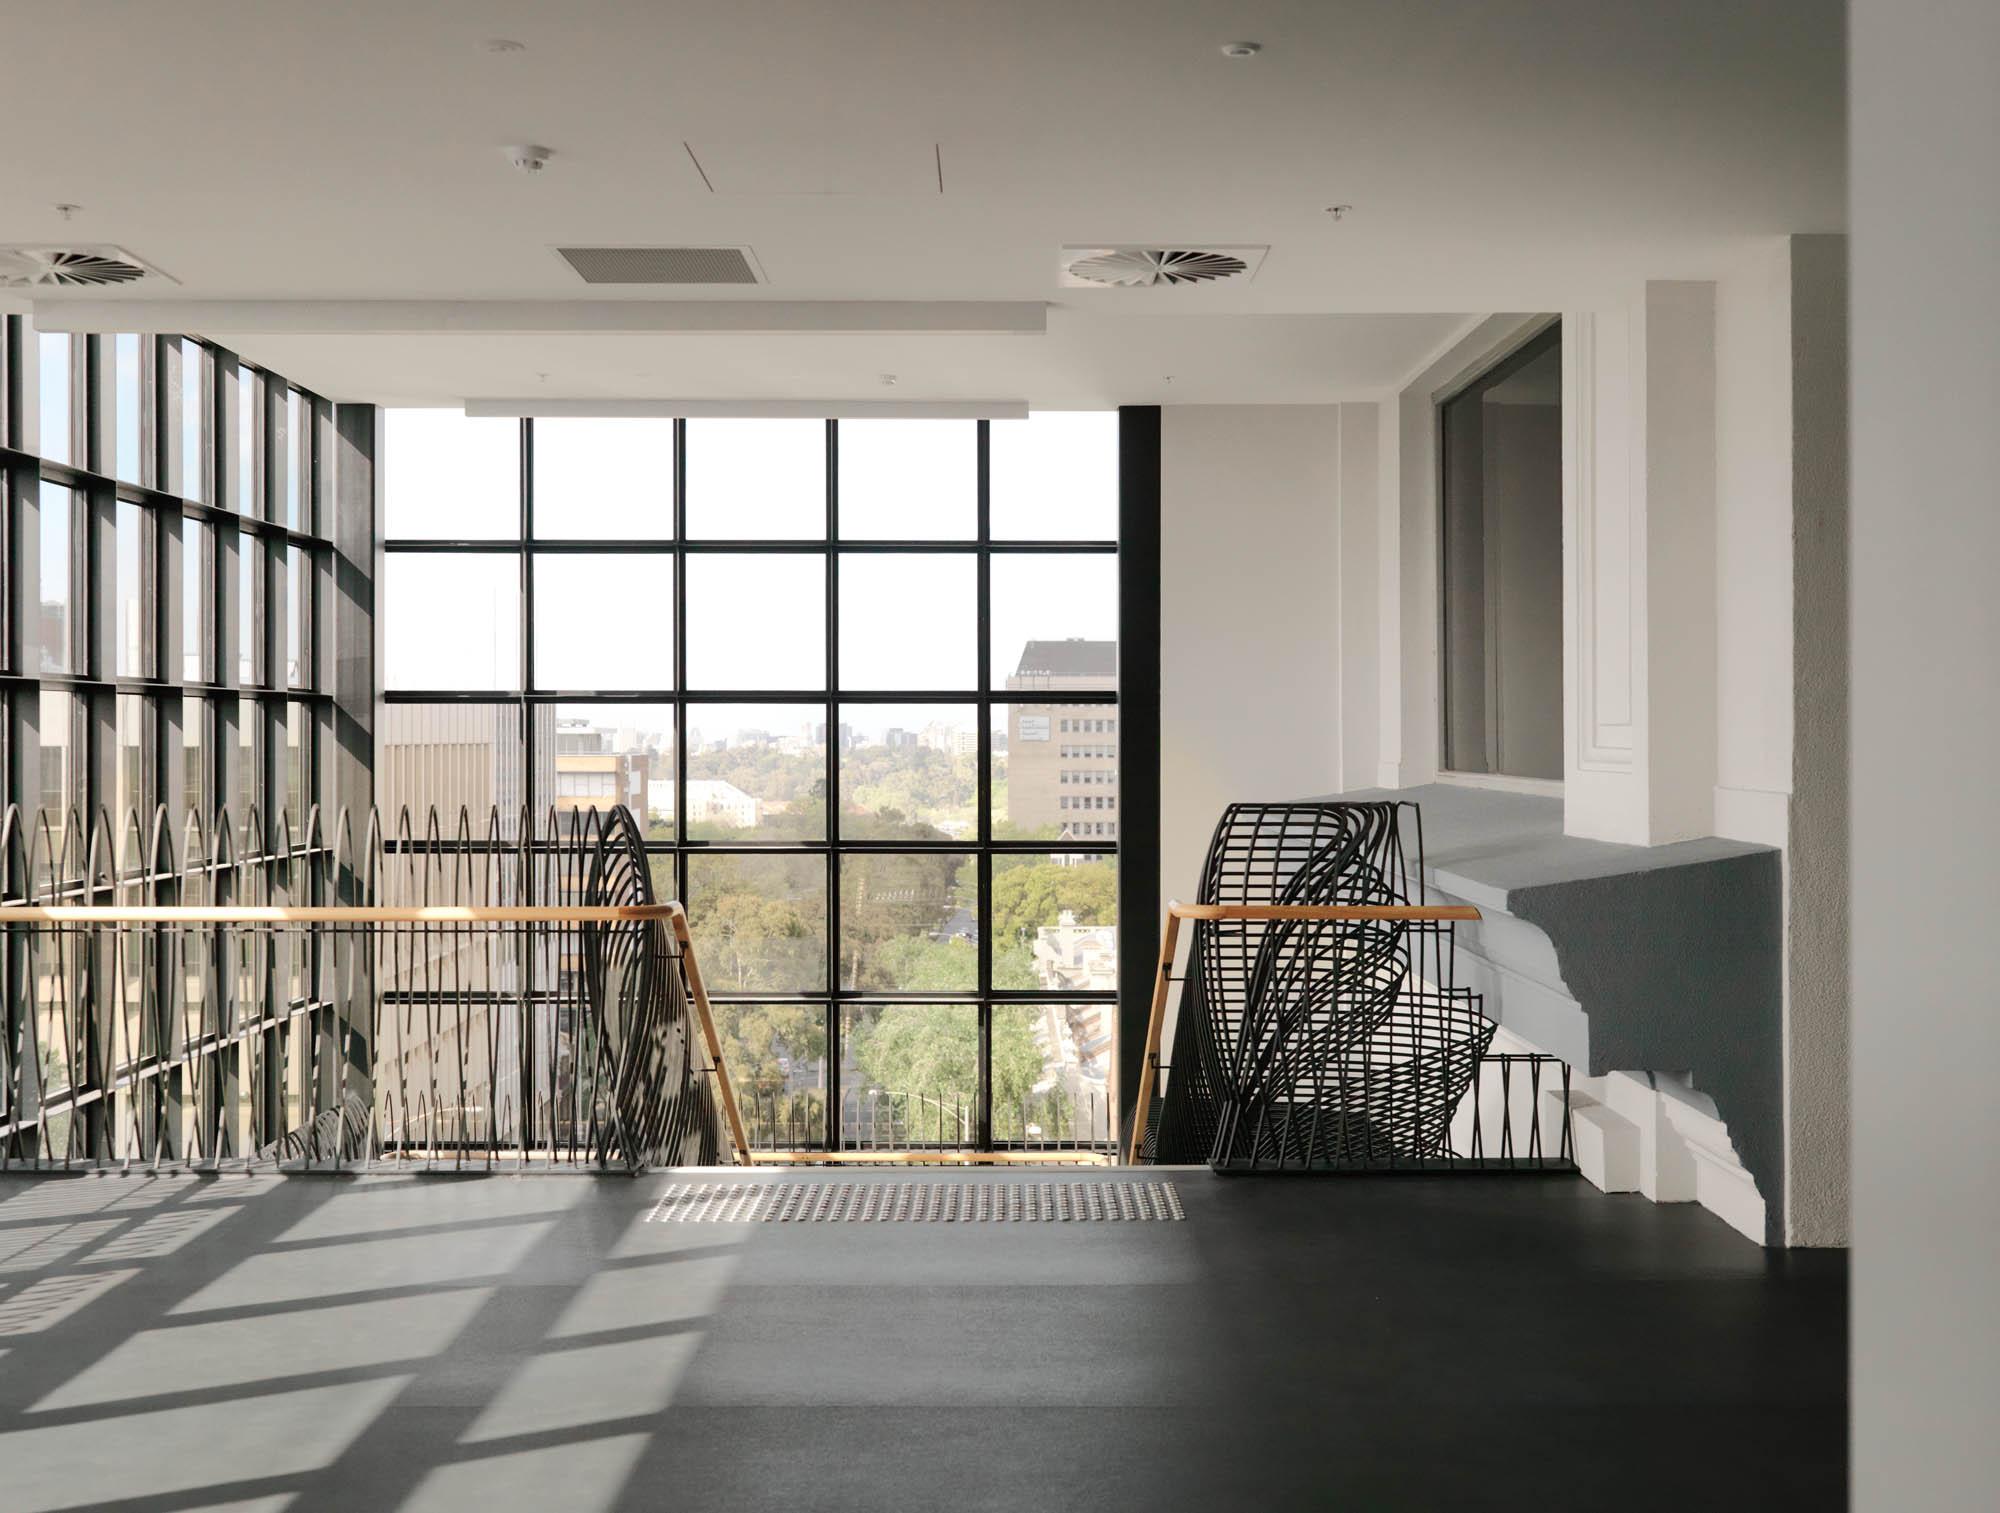 australia catholic university melbourne construction staircase landing 6561148